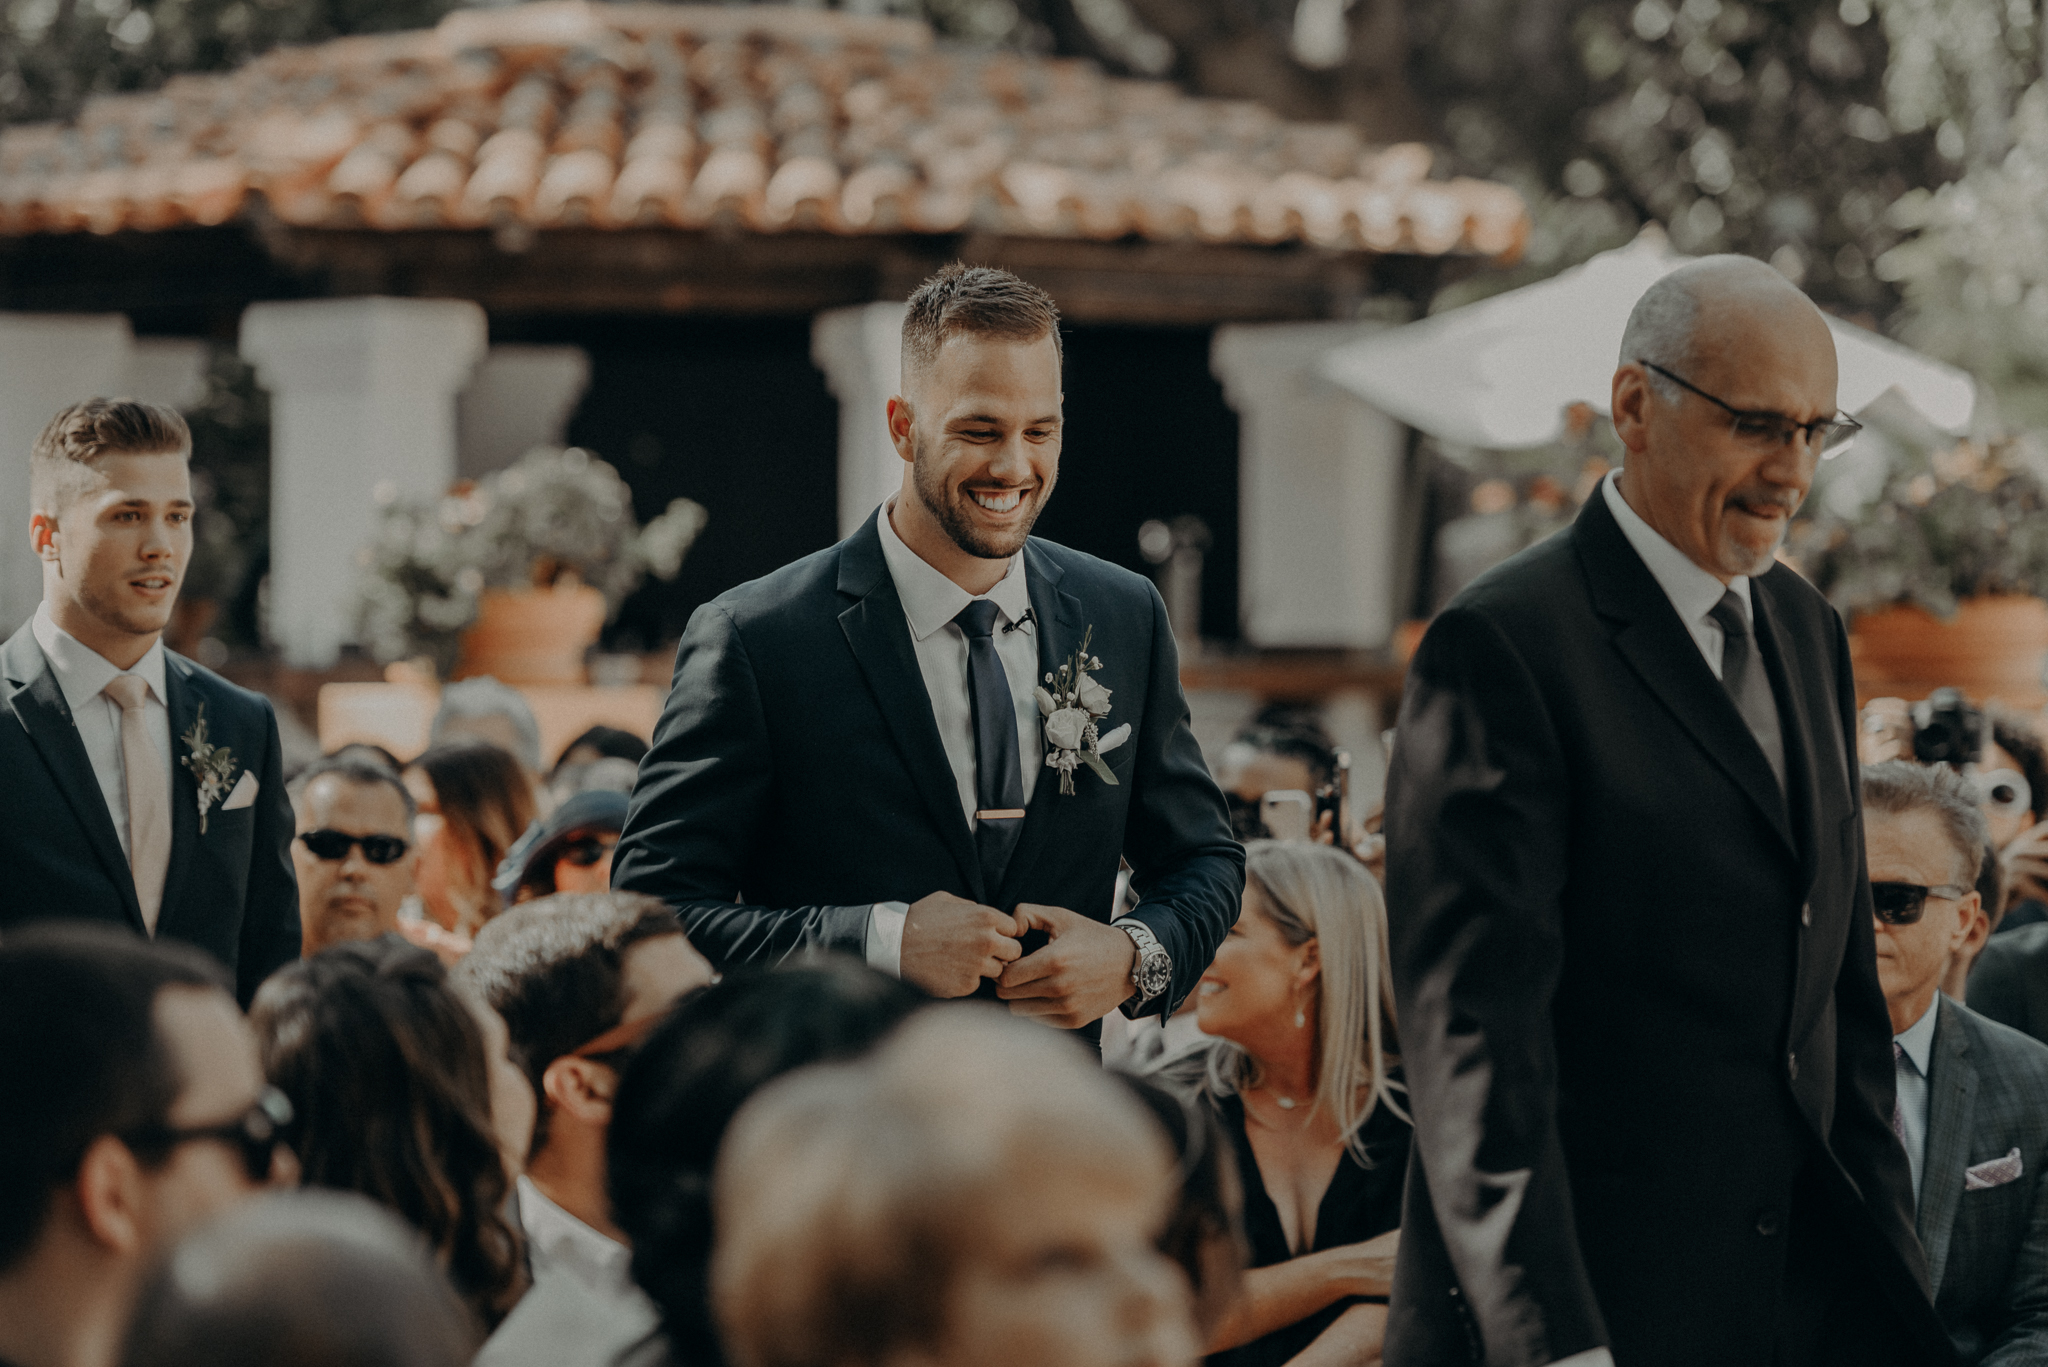 Isaiah + Taylor Photography - Rancho Las Lomas Wedding, Los Angeles Wedding Photographer-043.jpg